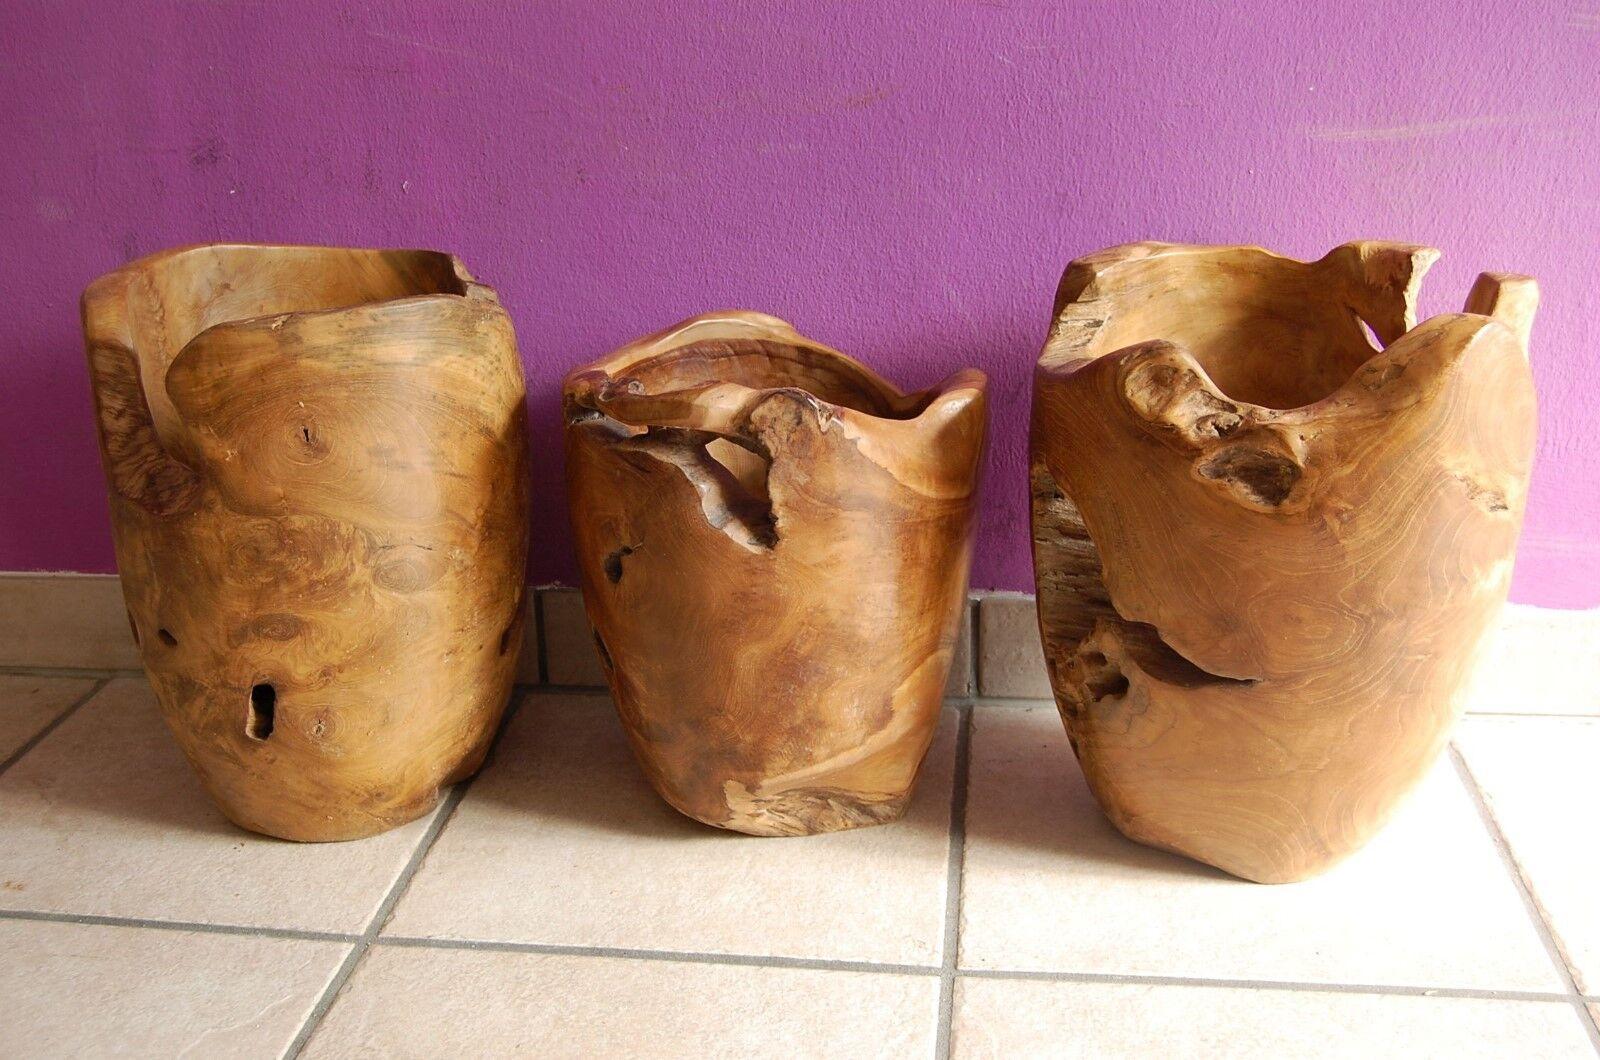 Deko Vase aus Teak Wurzelholz Bodenvase Standvase Vase Massivholz Edel Holz